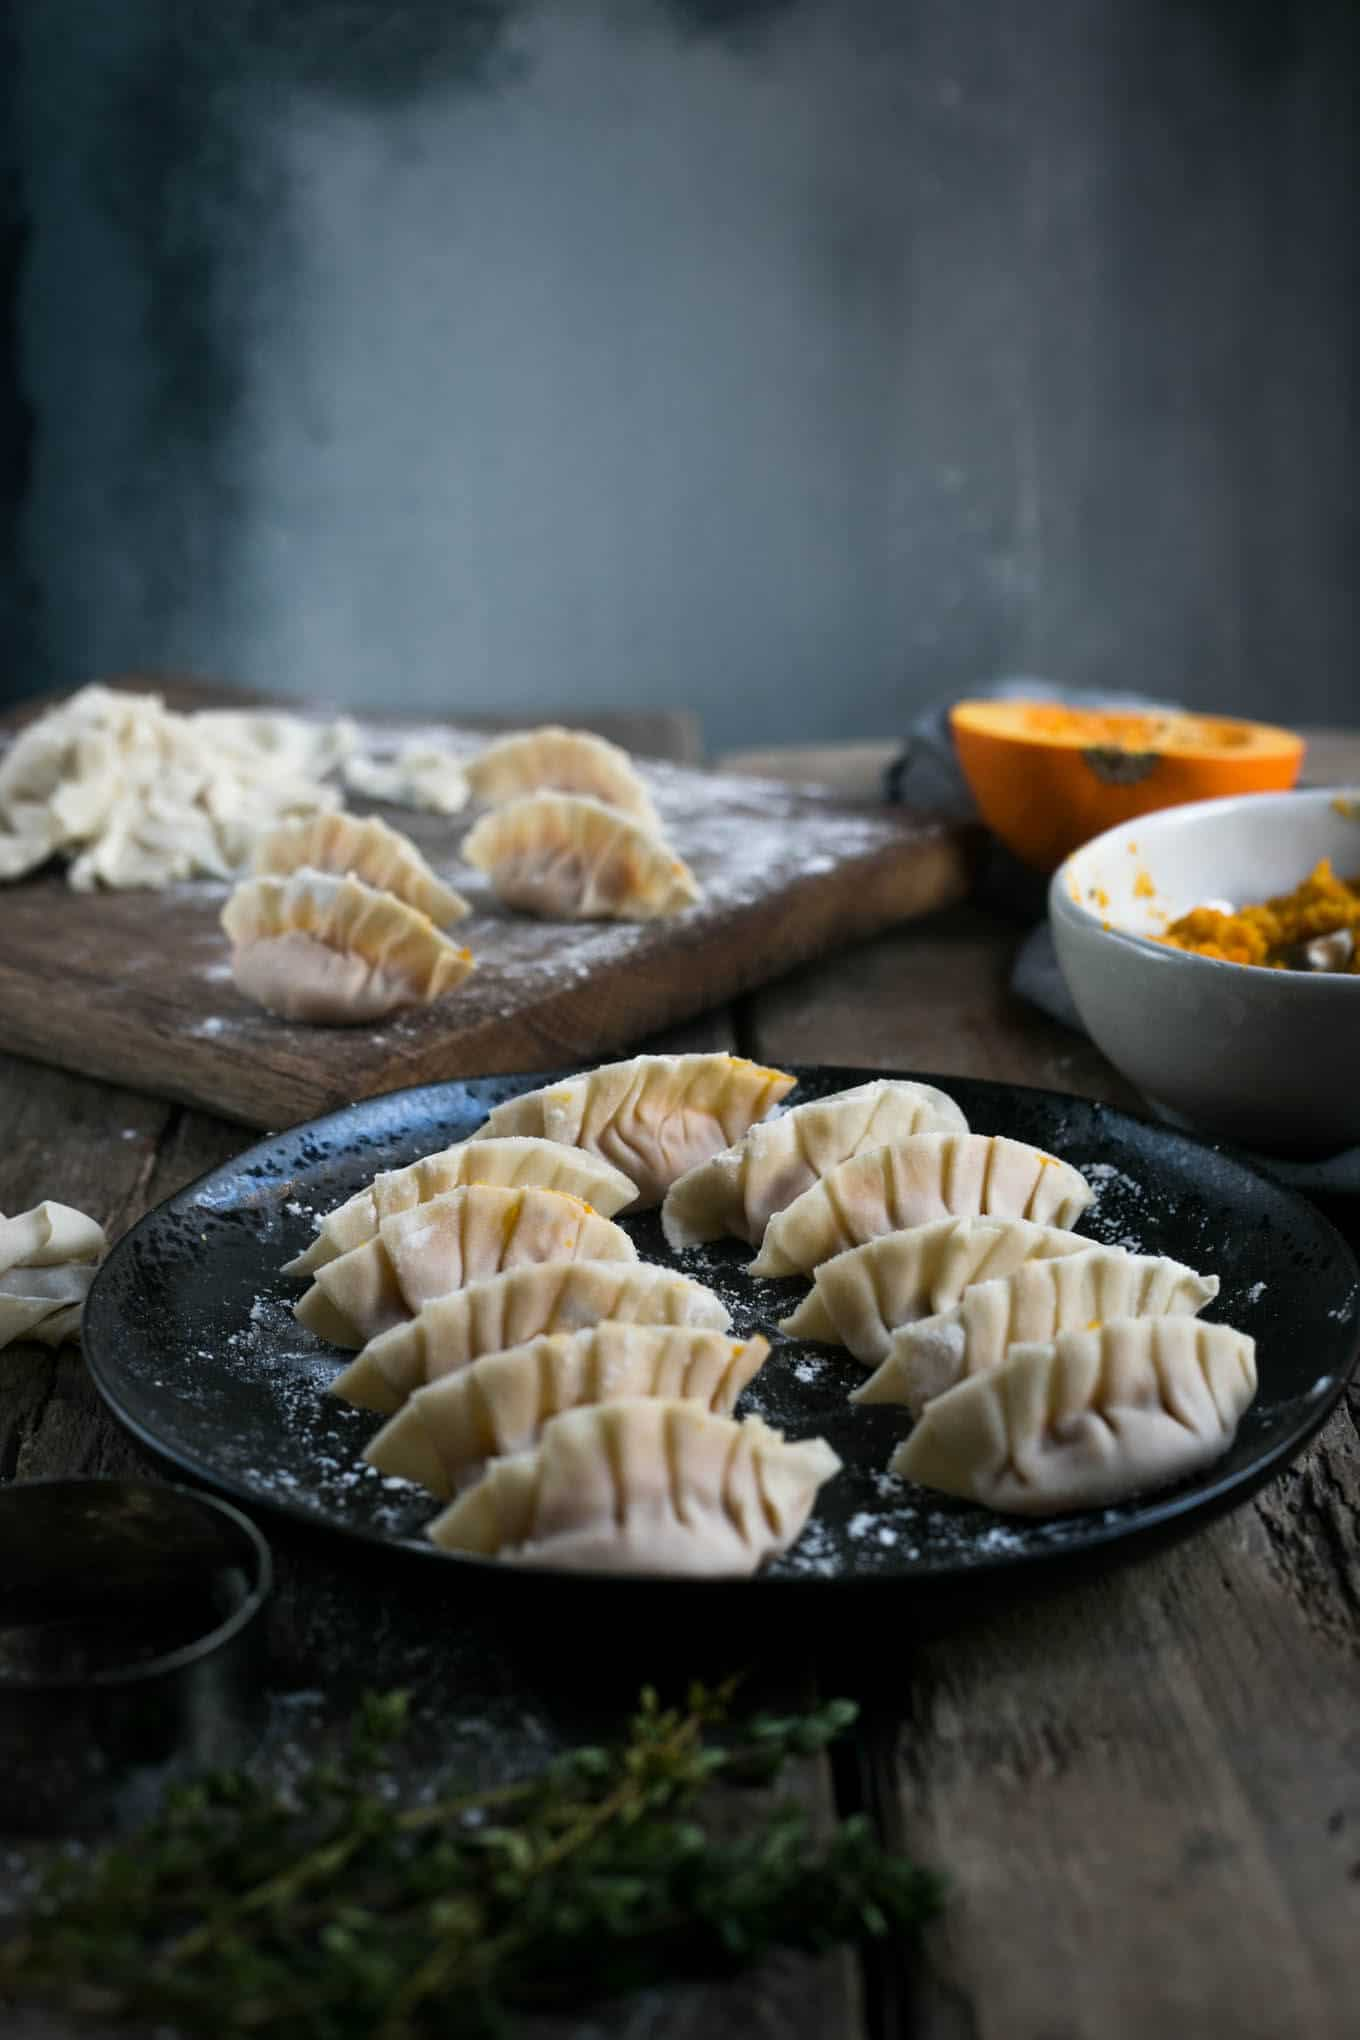 Pumpkin and root vegetable goyoza dumplings #vegan #pumpkin #goyoza | via @annabanana.co